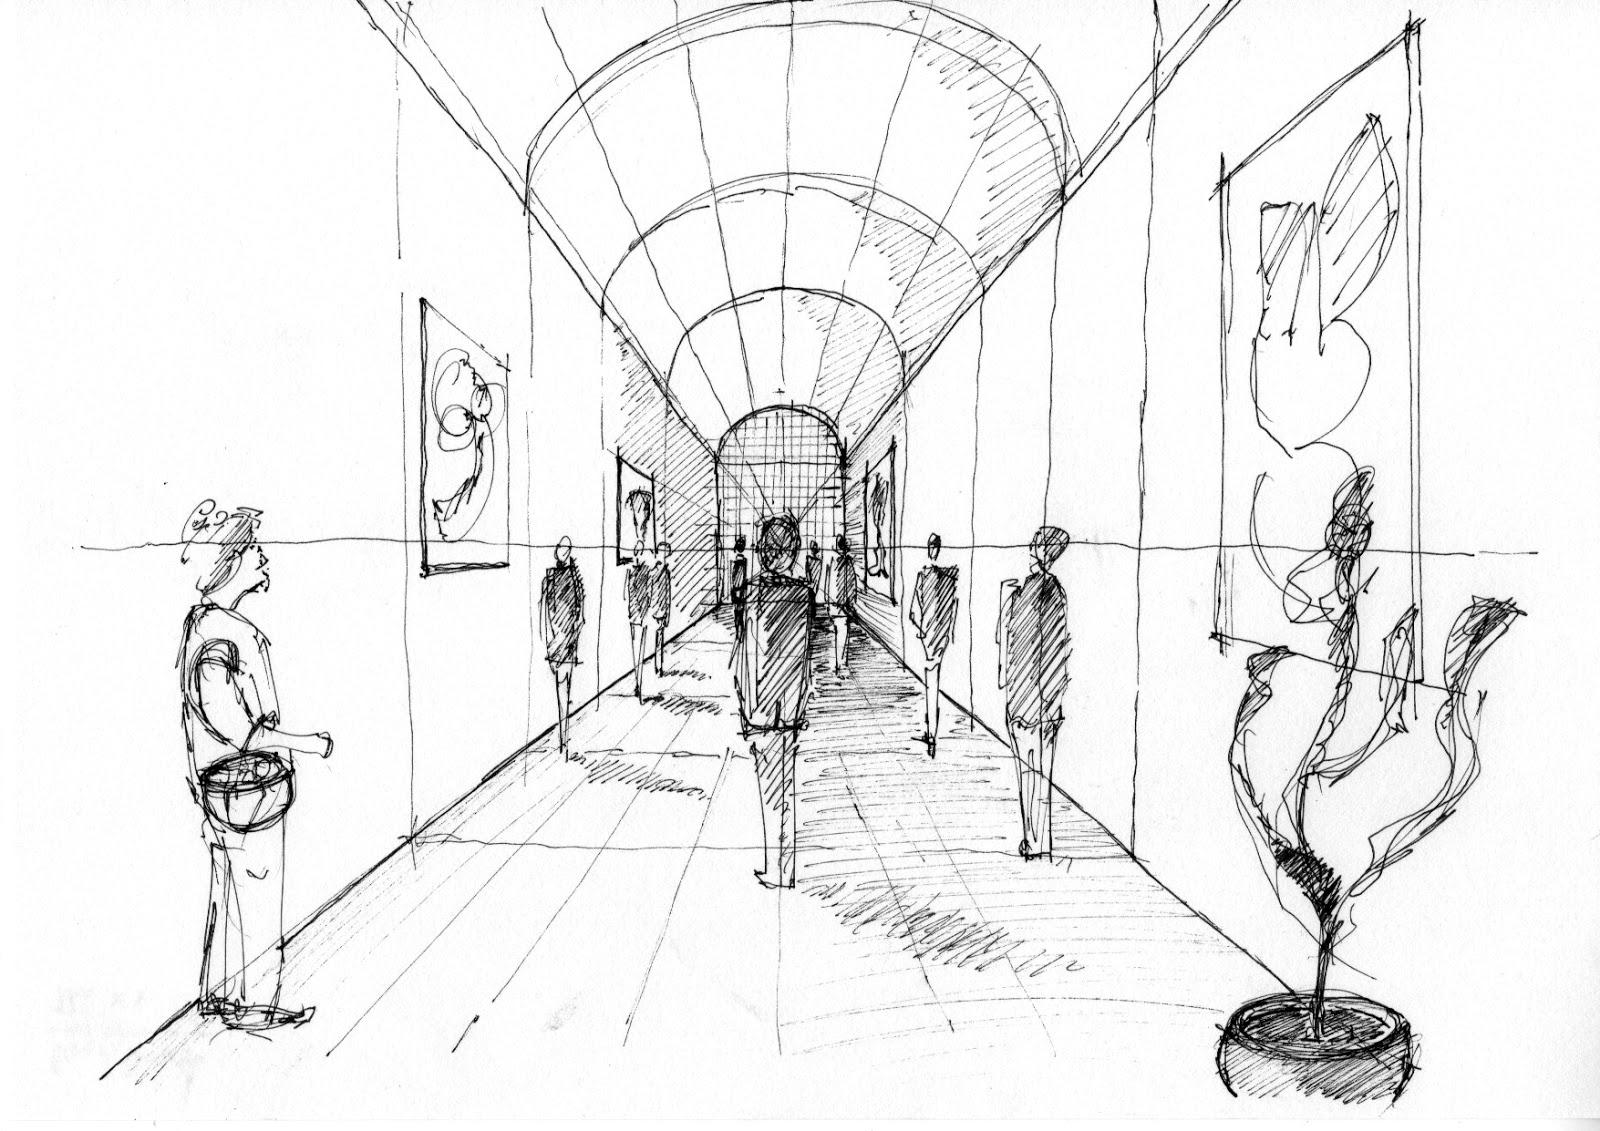 S k i z z e r a skizzierkurs lektion 9 perspektive - Architektur skizze ...